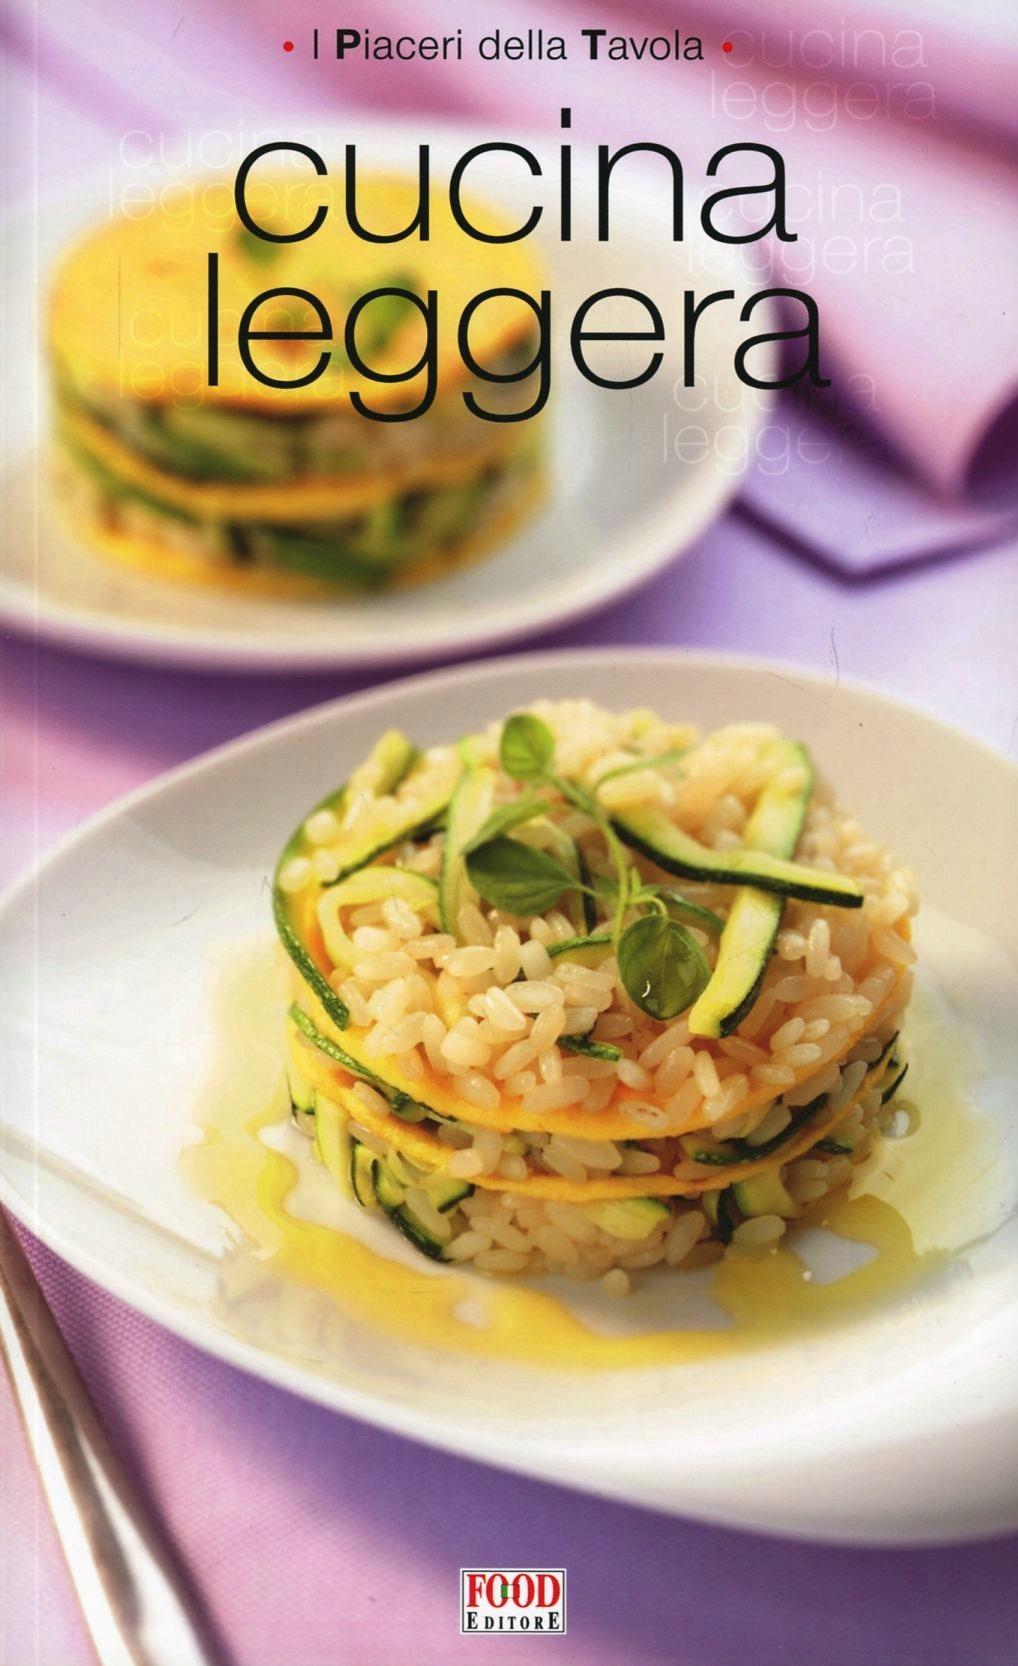 Image of Cucina leggera